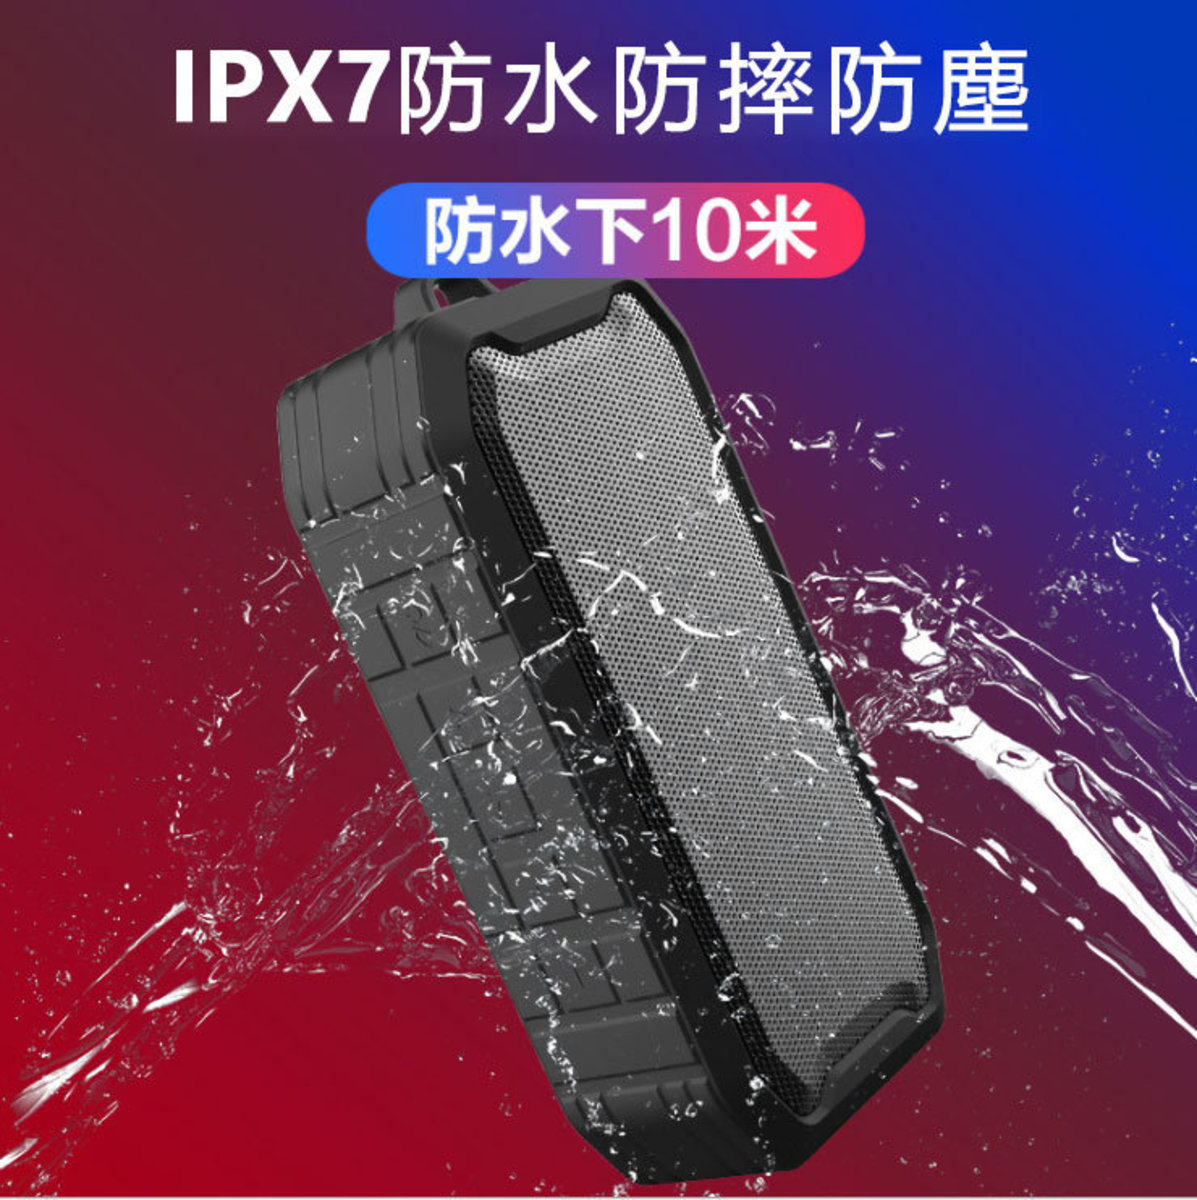 Korea JK V5.0 wireless Bluetooth audio IPX7 waterproof sports card audio